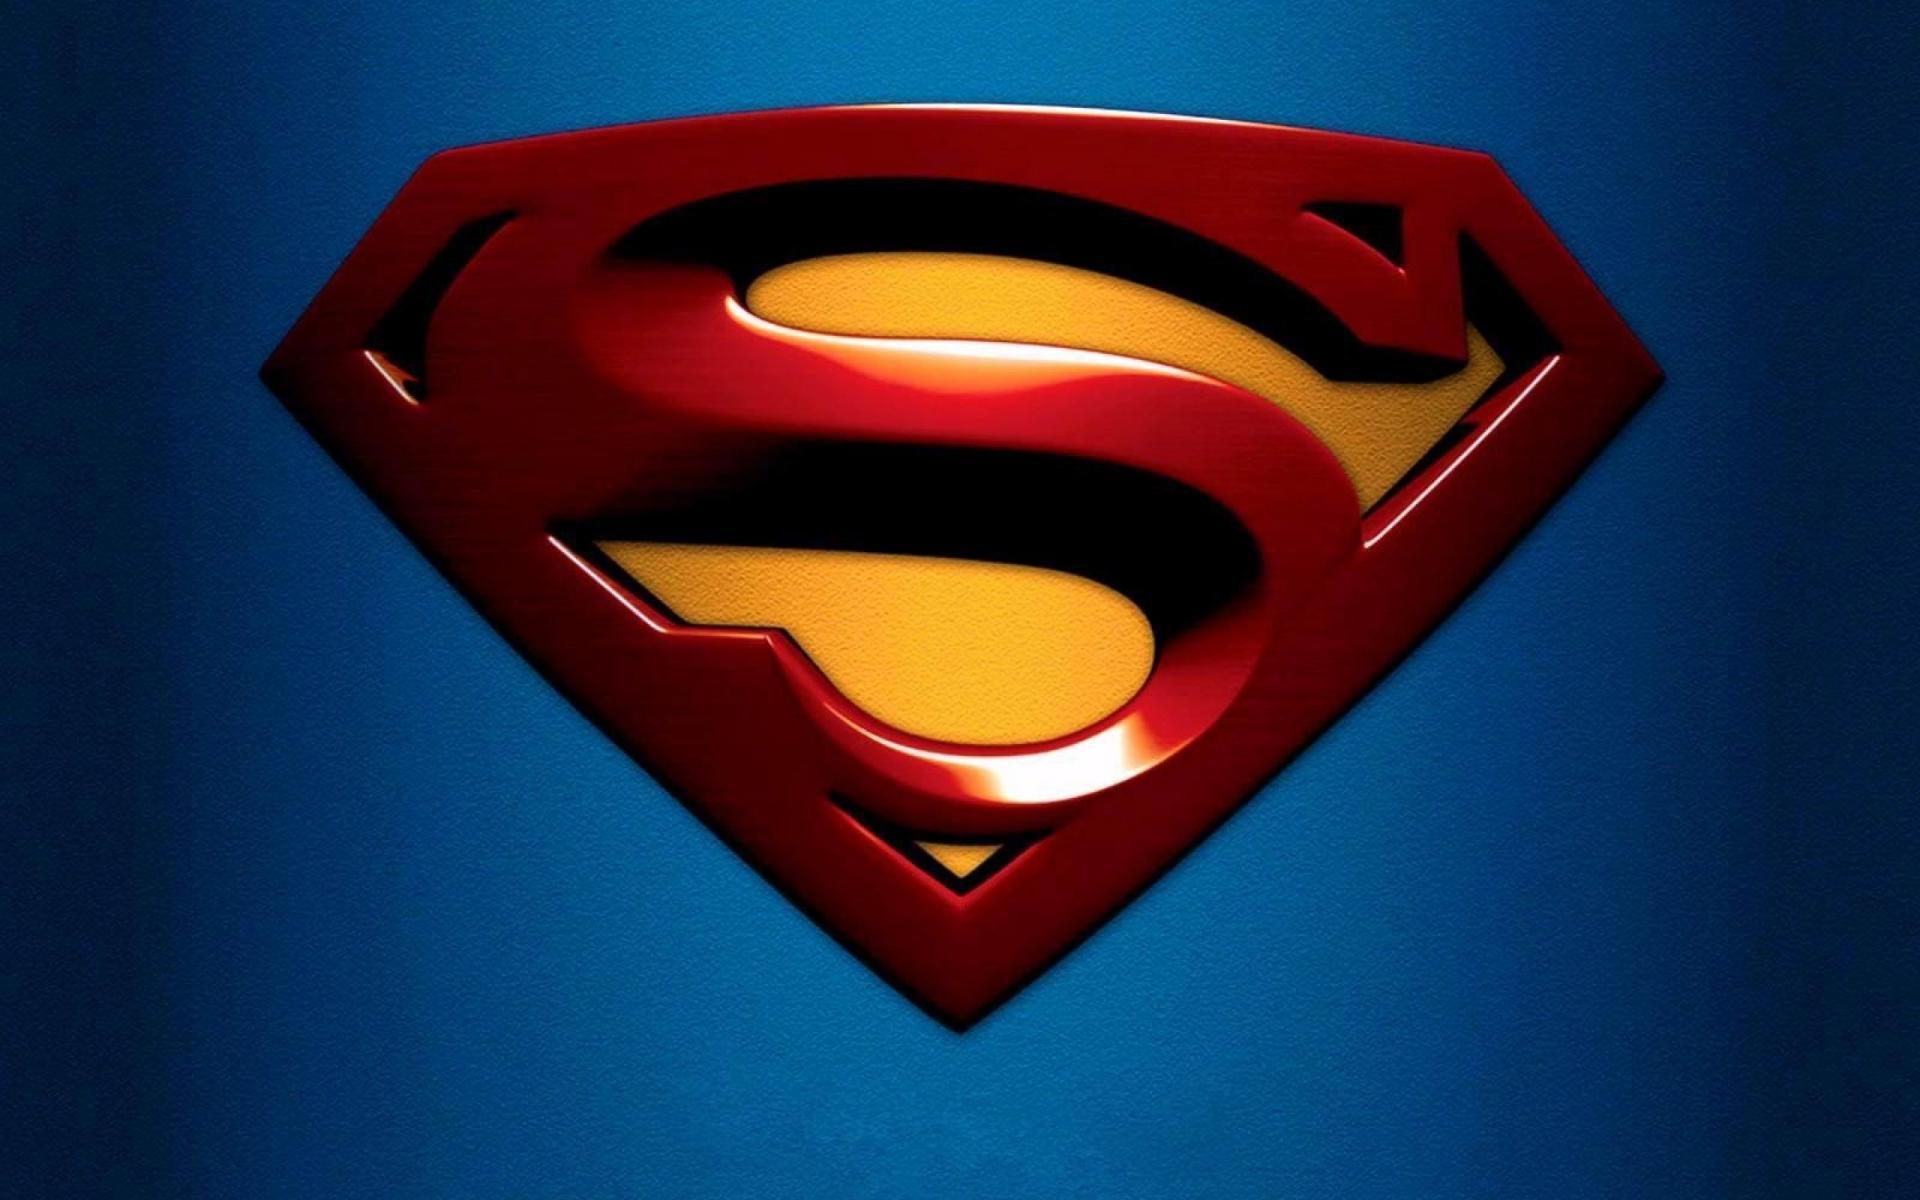 superman-returns-superman-logo-1920-1200-resolution